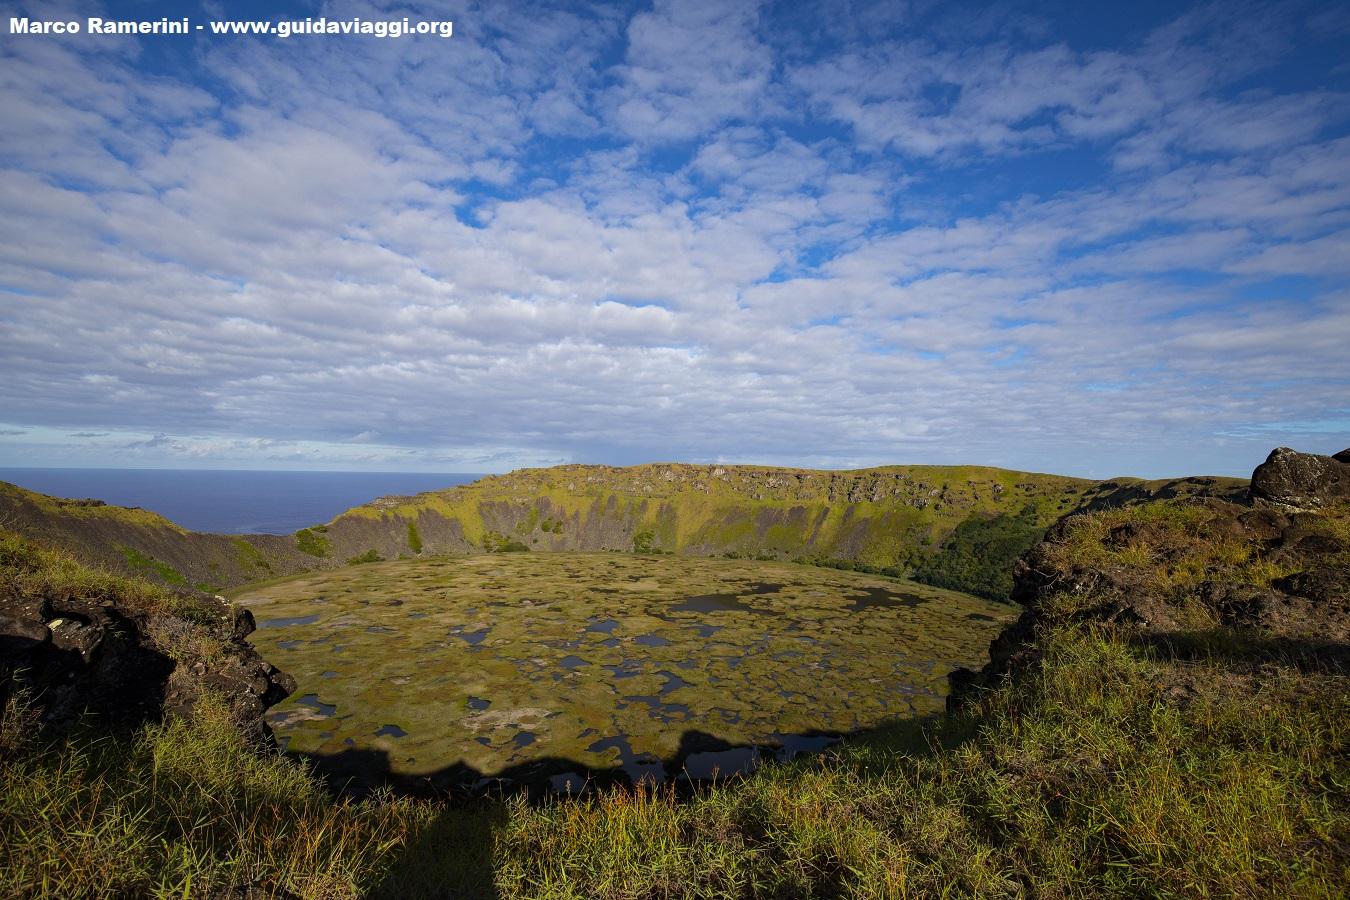 Rano Kau, Ilha de Páscoa, Chile. Autor e Copyright Marco Ramerini.